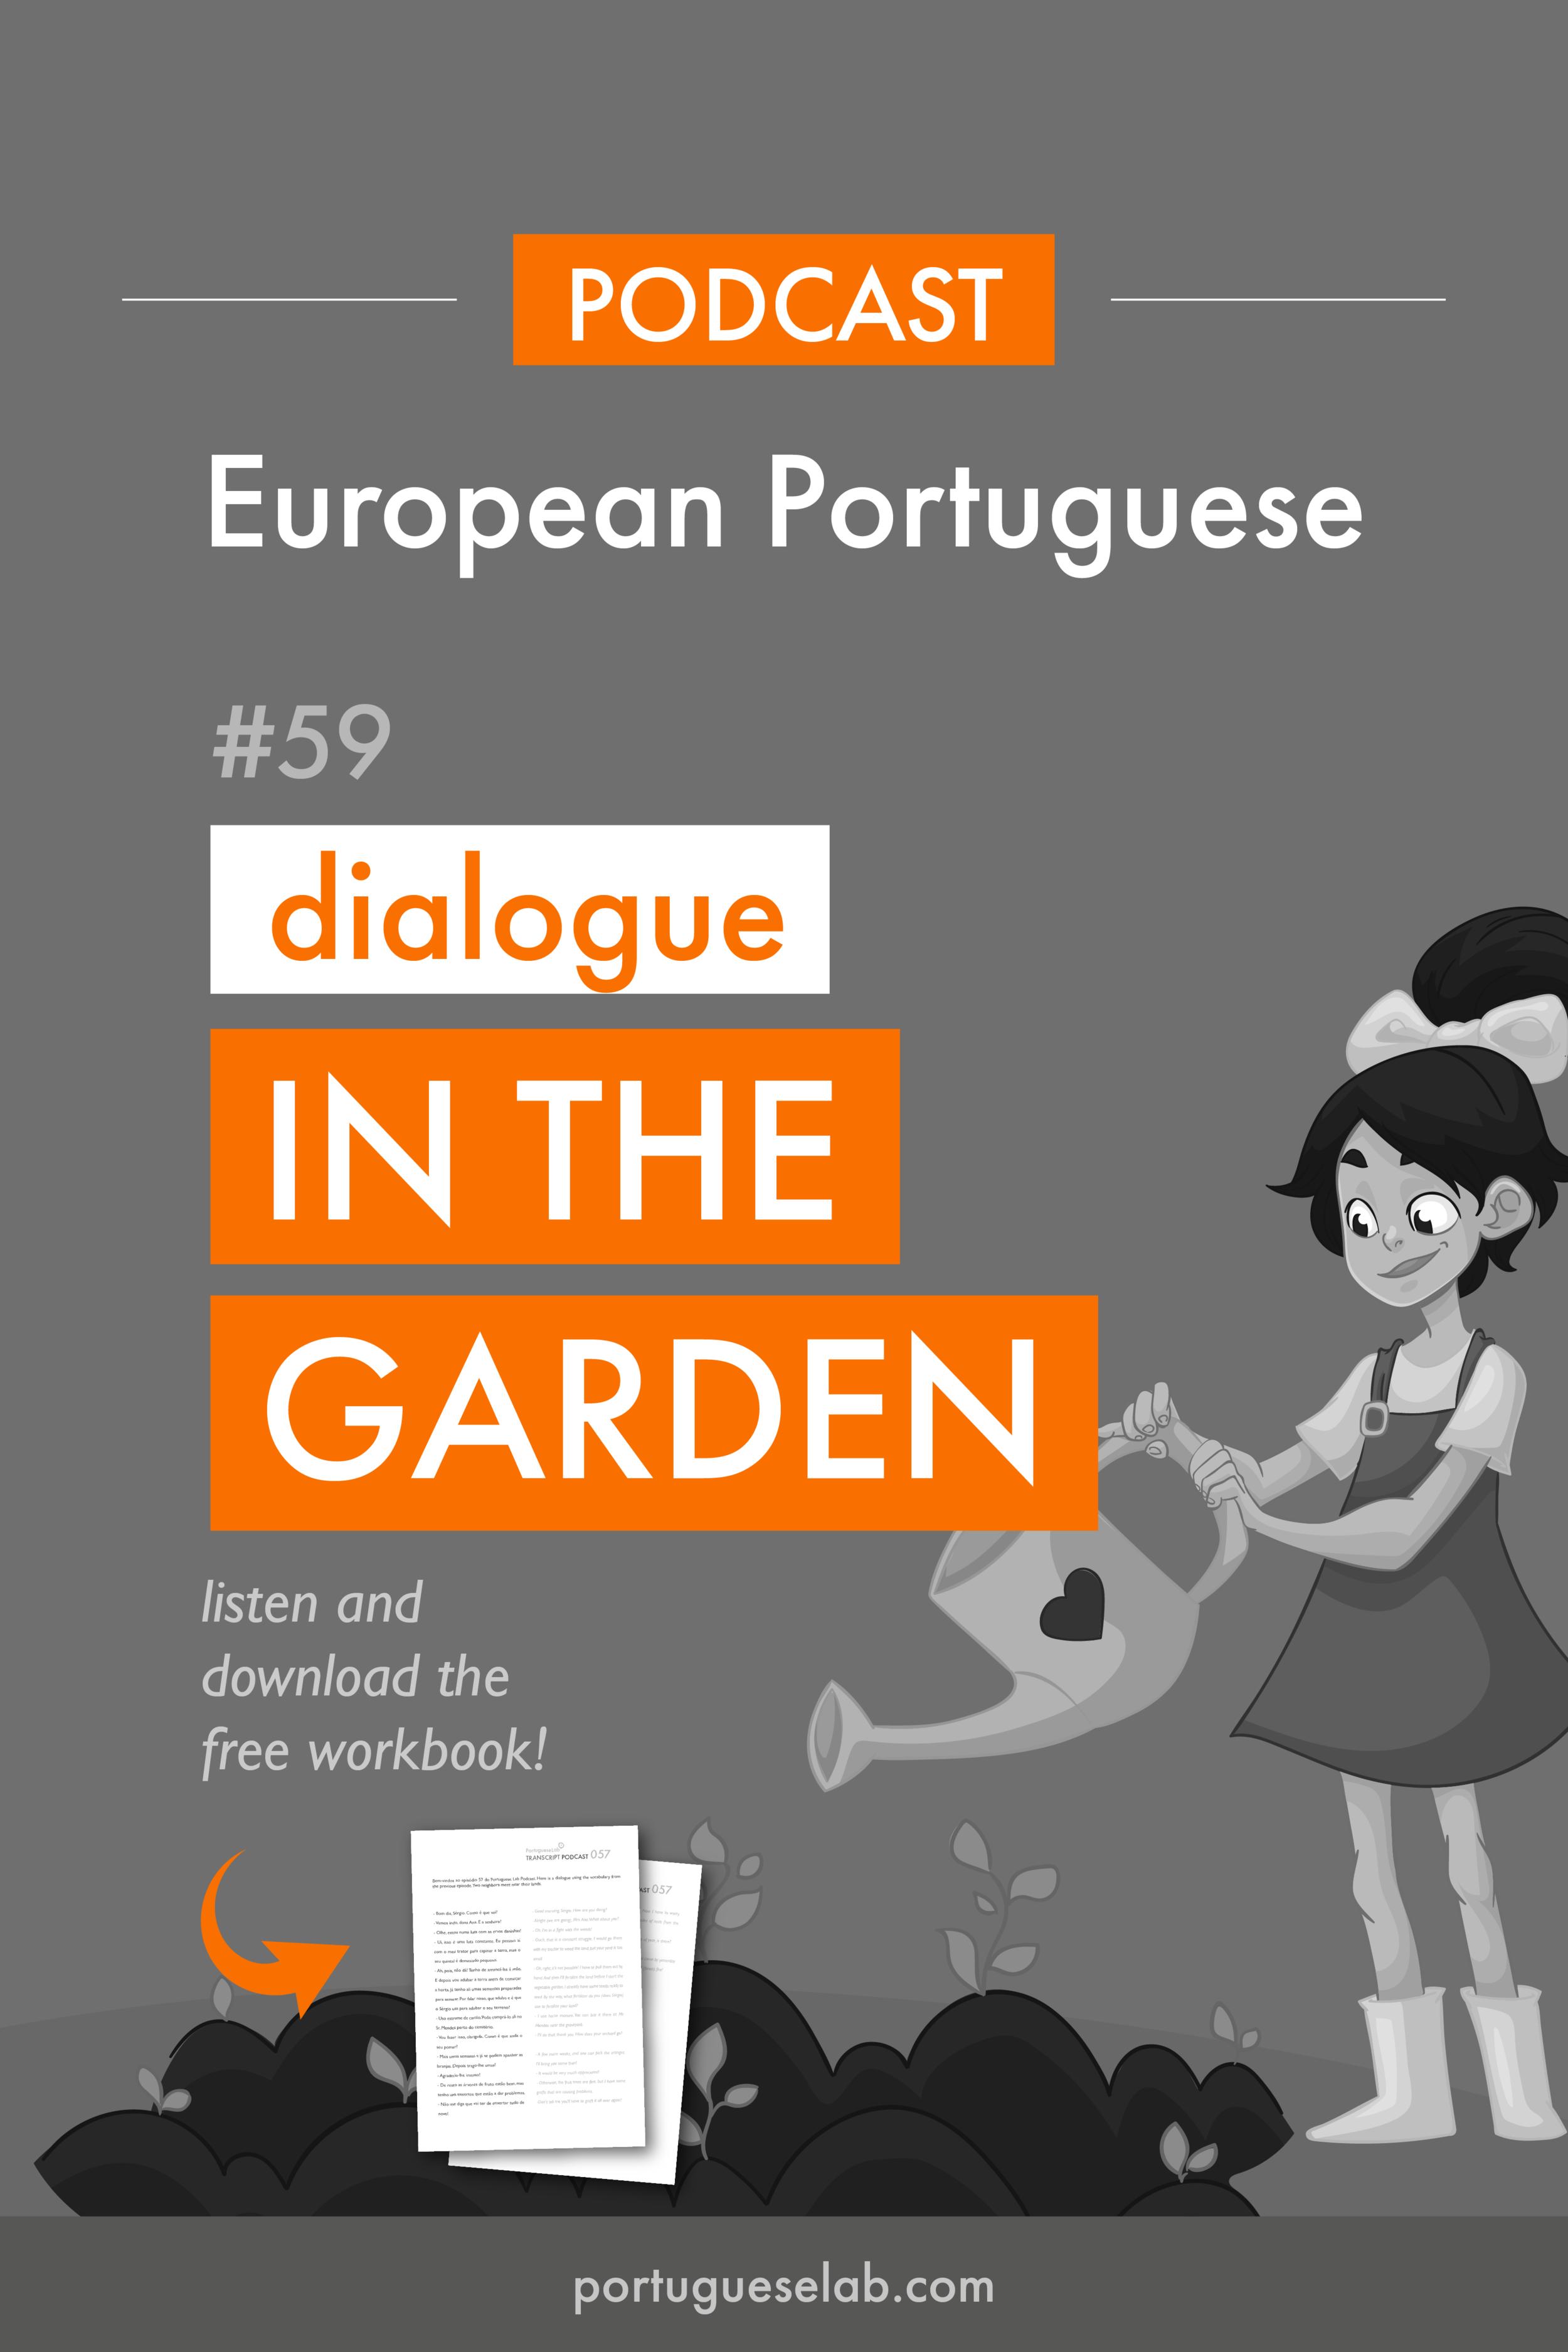 Portuguese Lab Podcast - European Portuguese - 59 - Dialogue in the garden